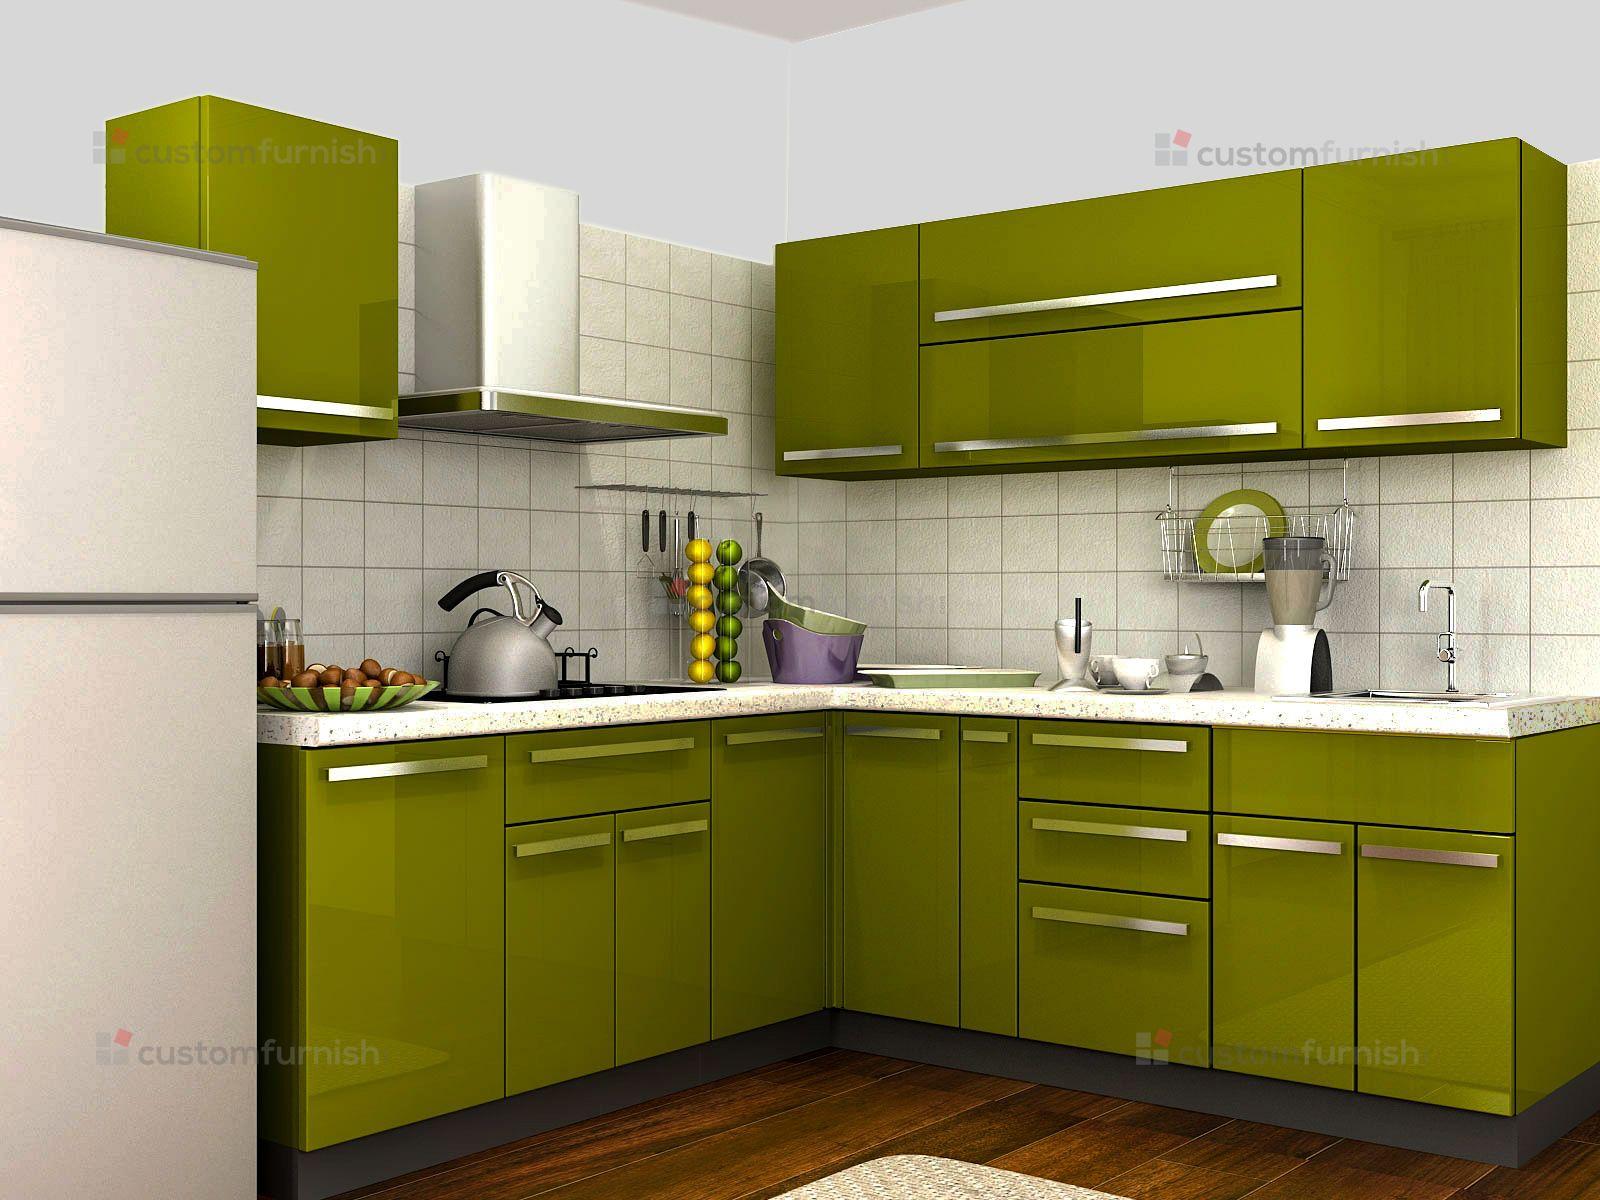 More Ideas Below Kitchenremodel Kitchenideas Indian Modular